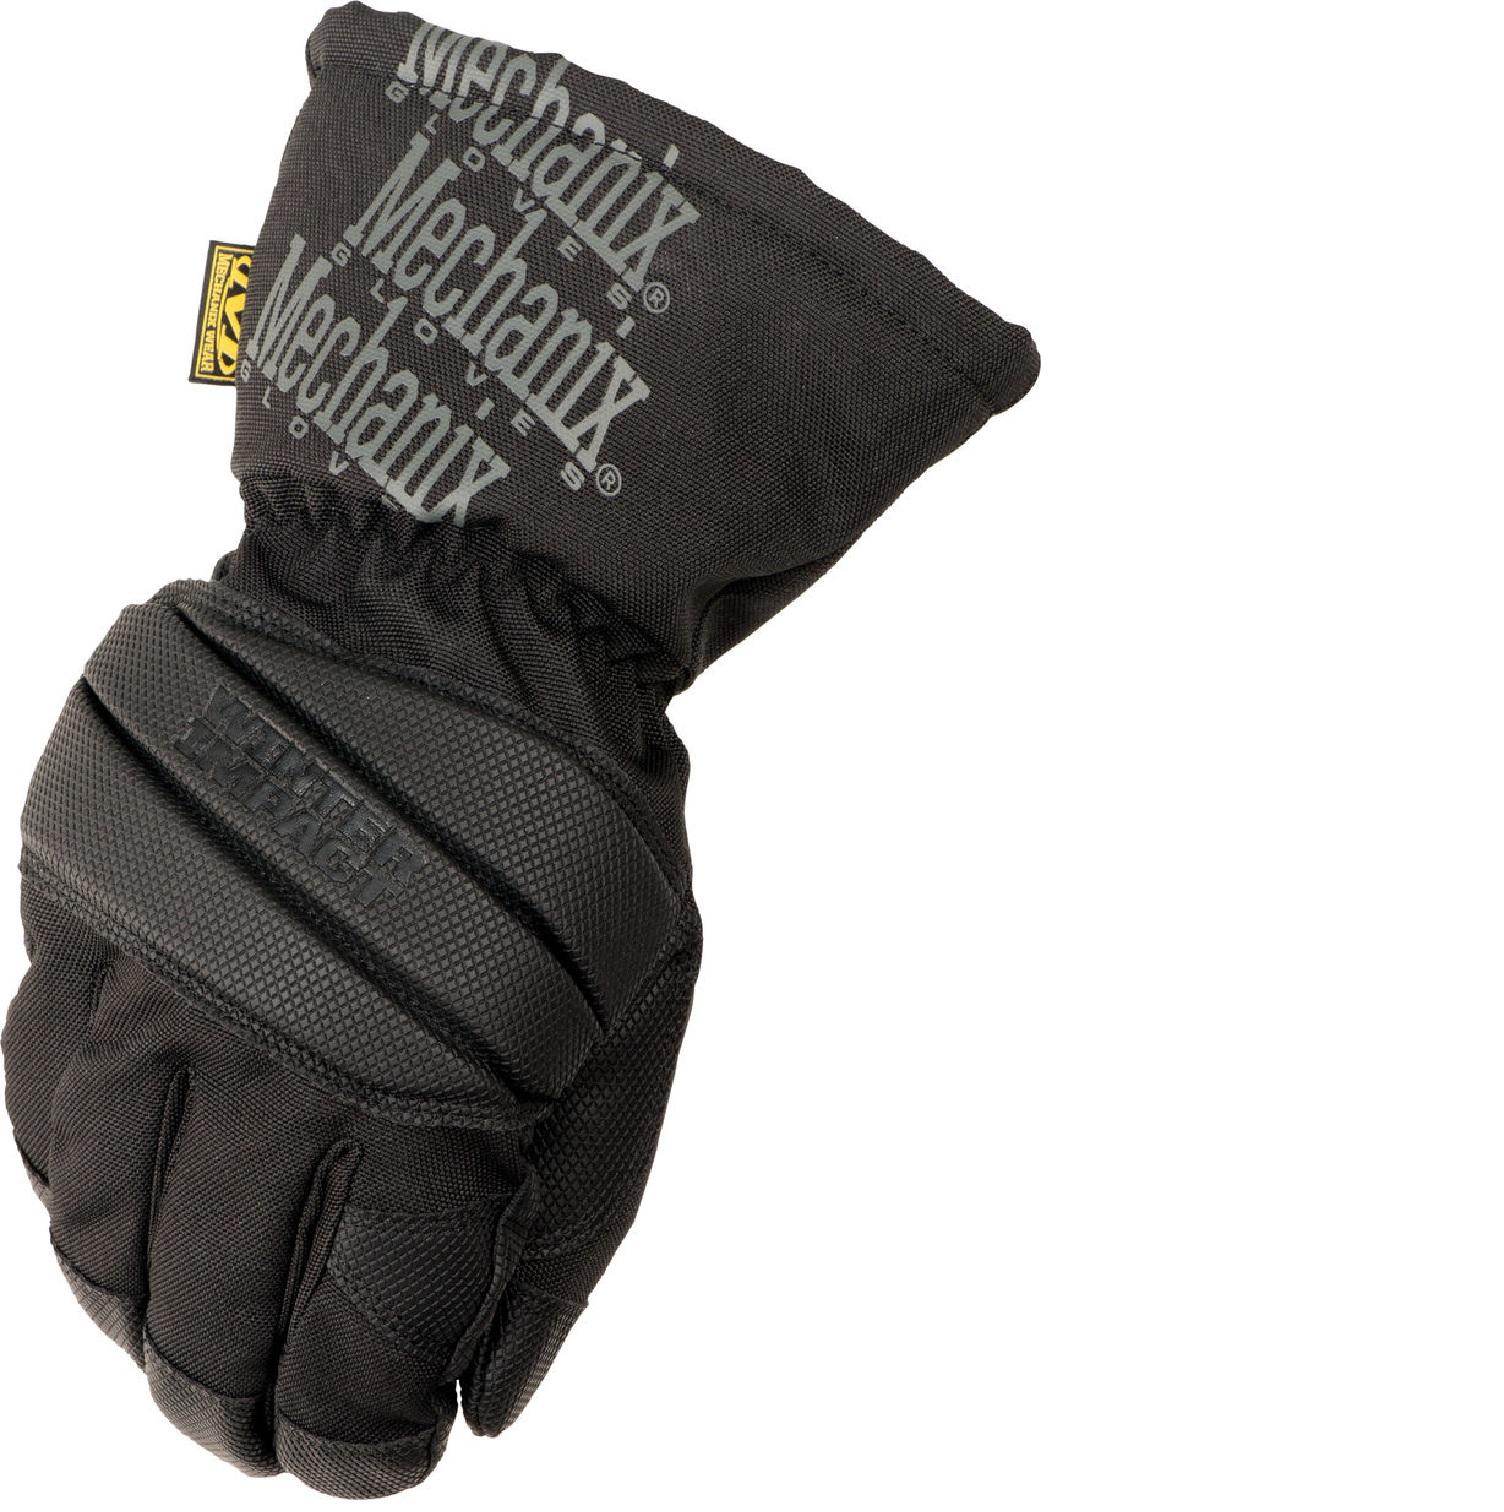 Mechanix Winter Impact Glove Black Small